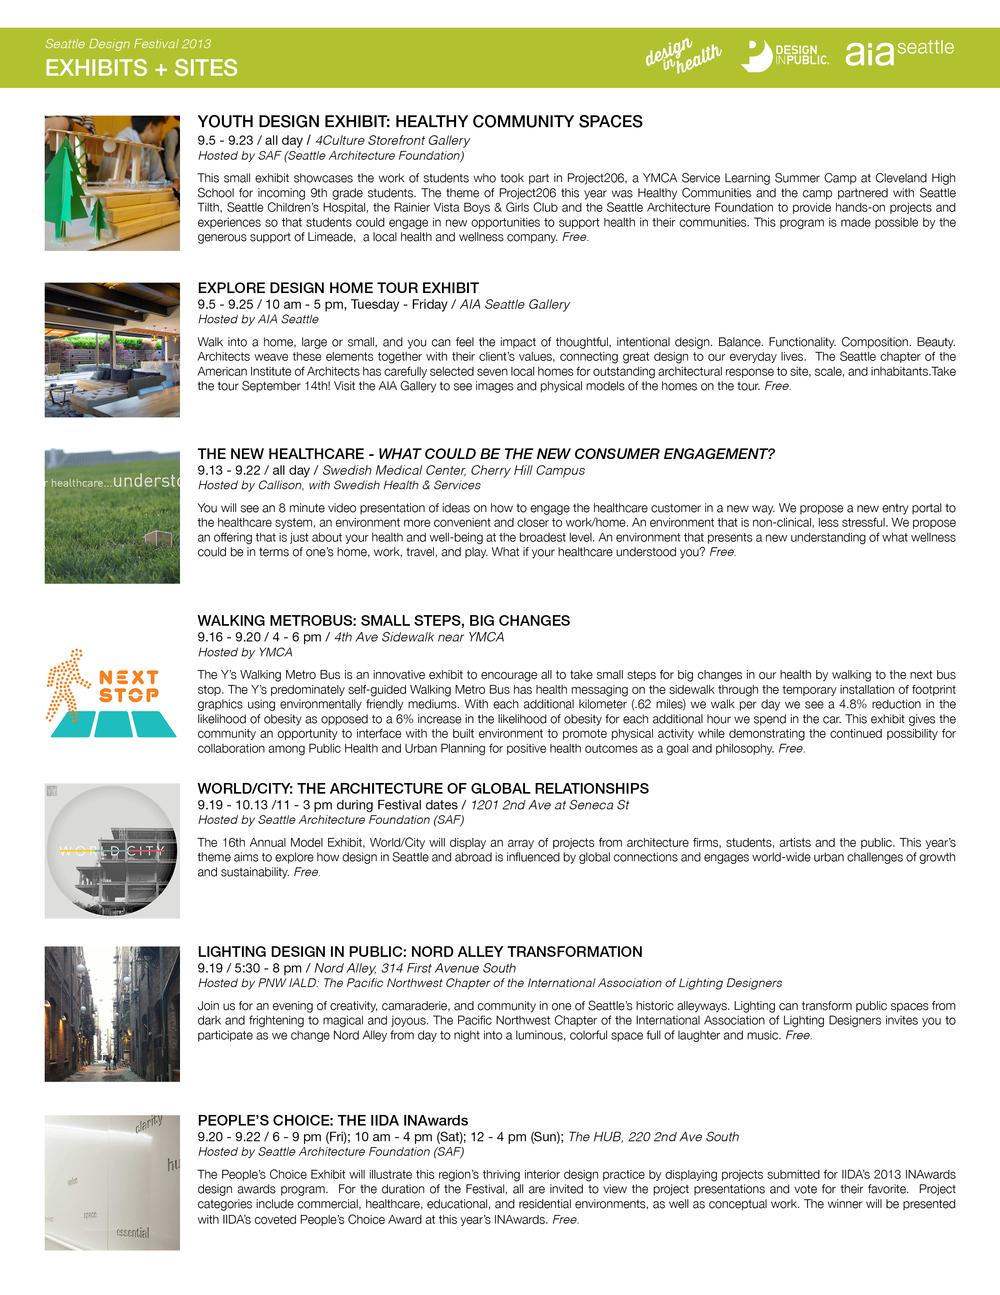 SDF13_festival program_of_events_web26.jpg